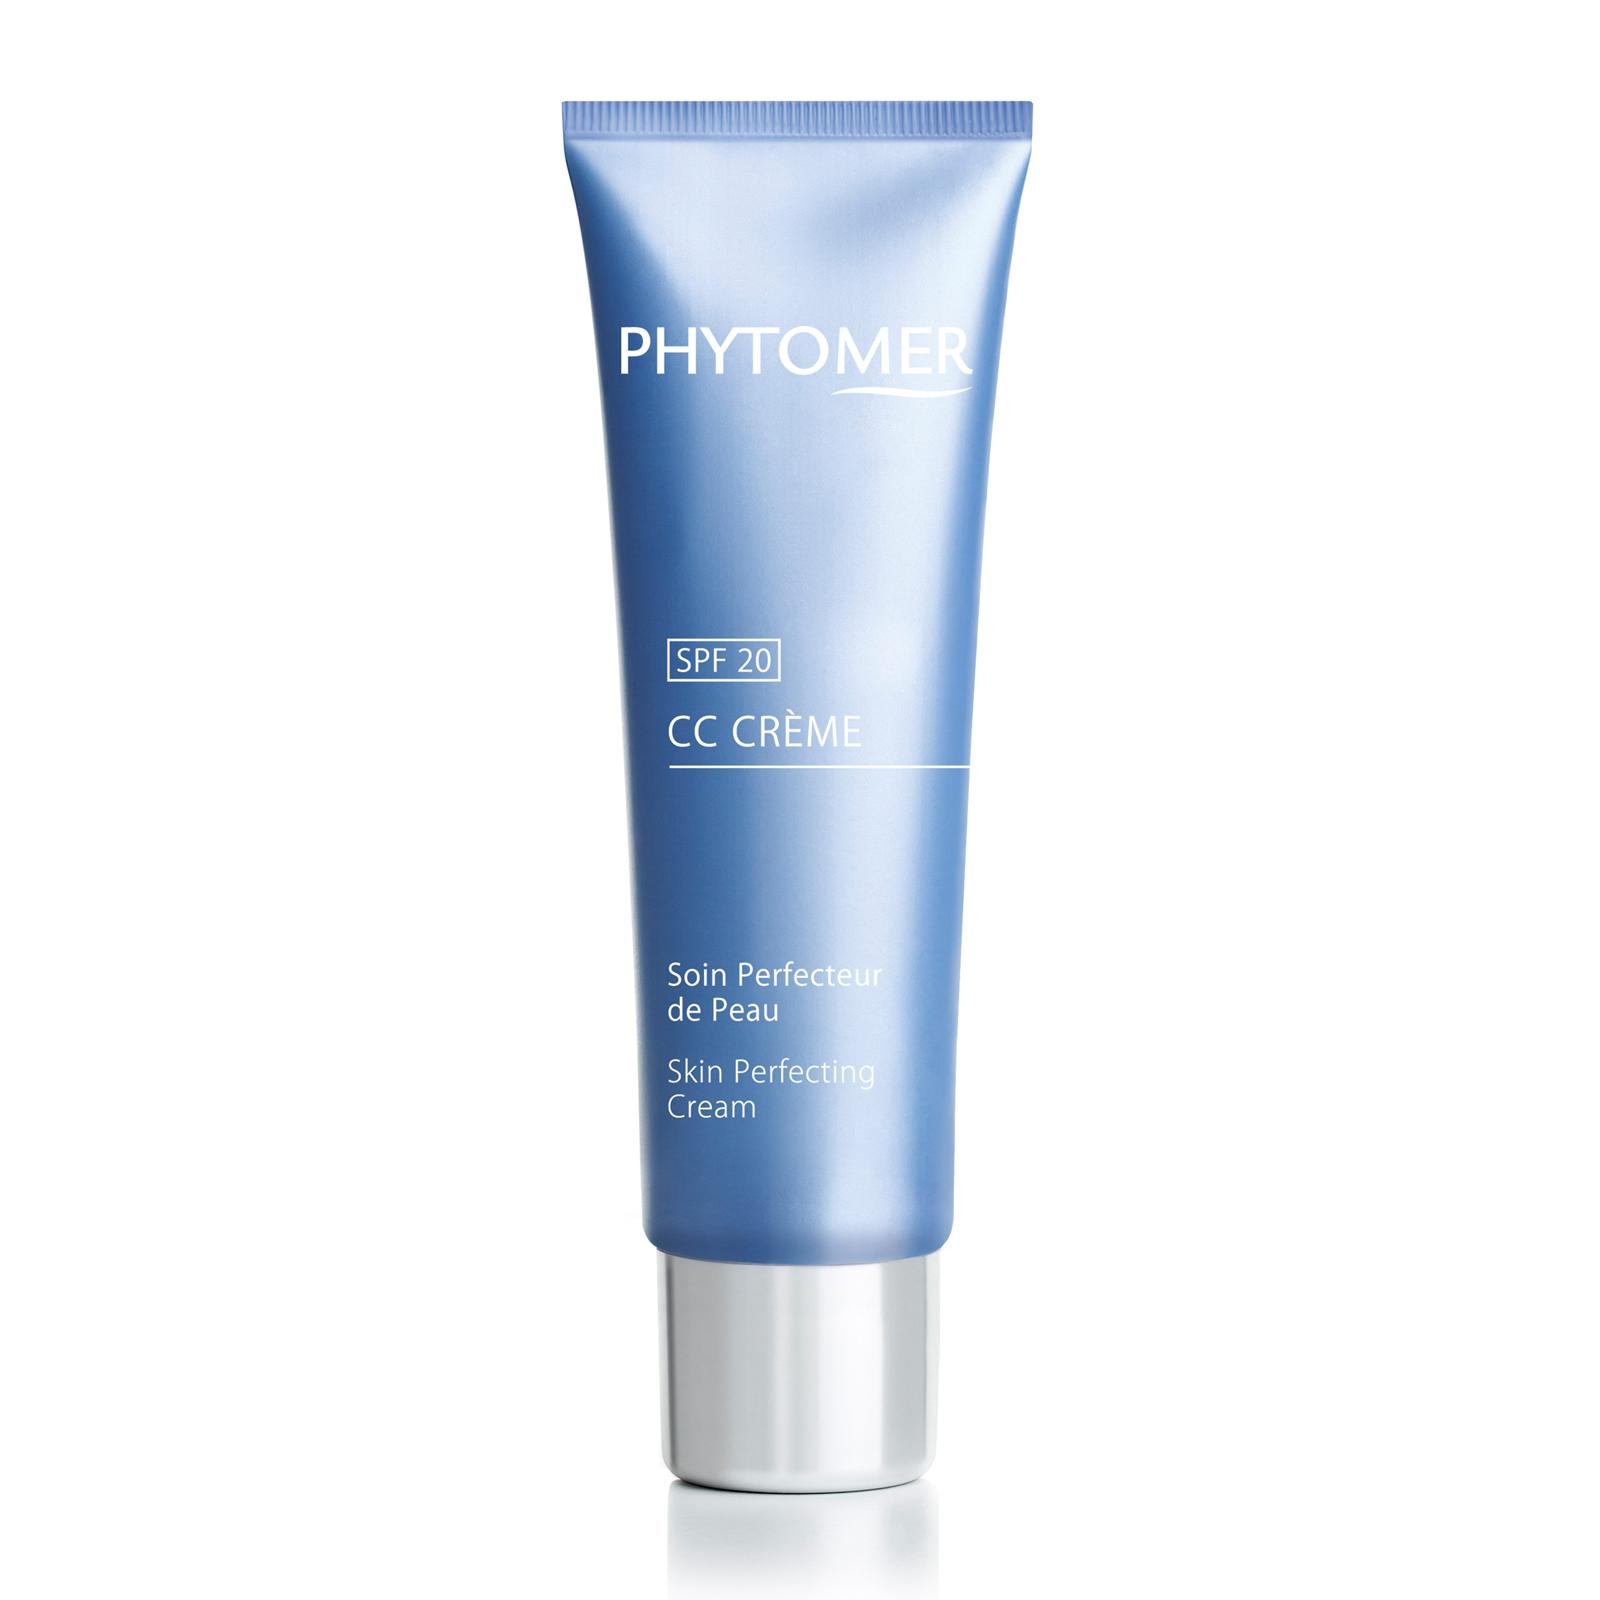 Phytomer_CC_Creme_50ml